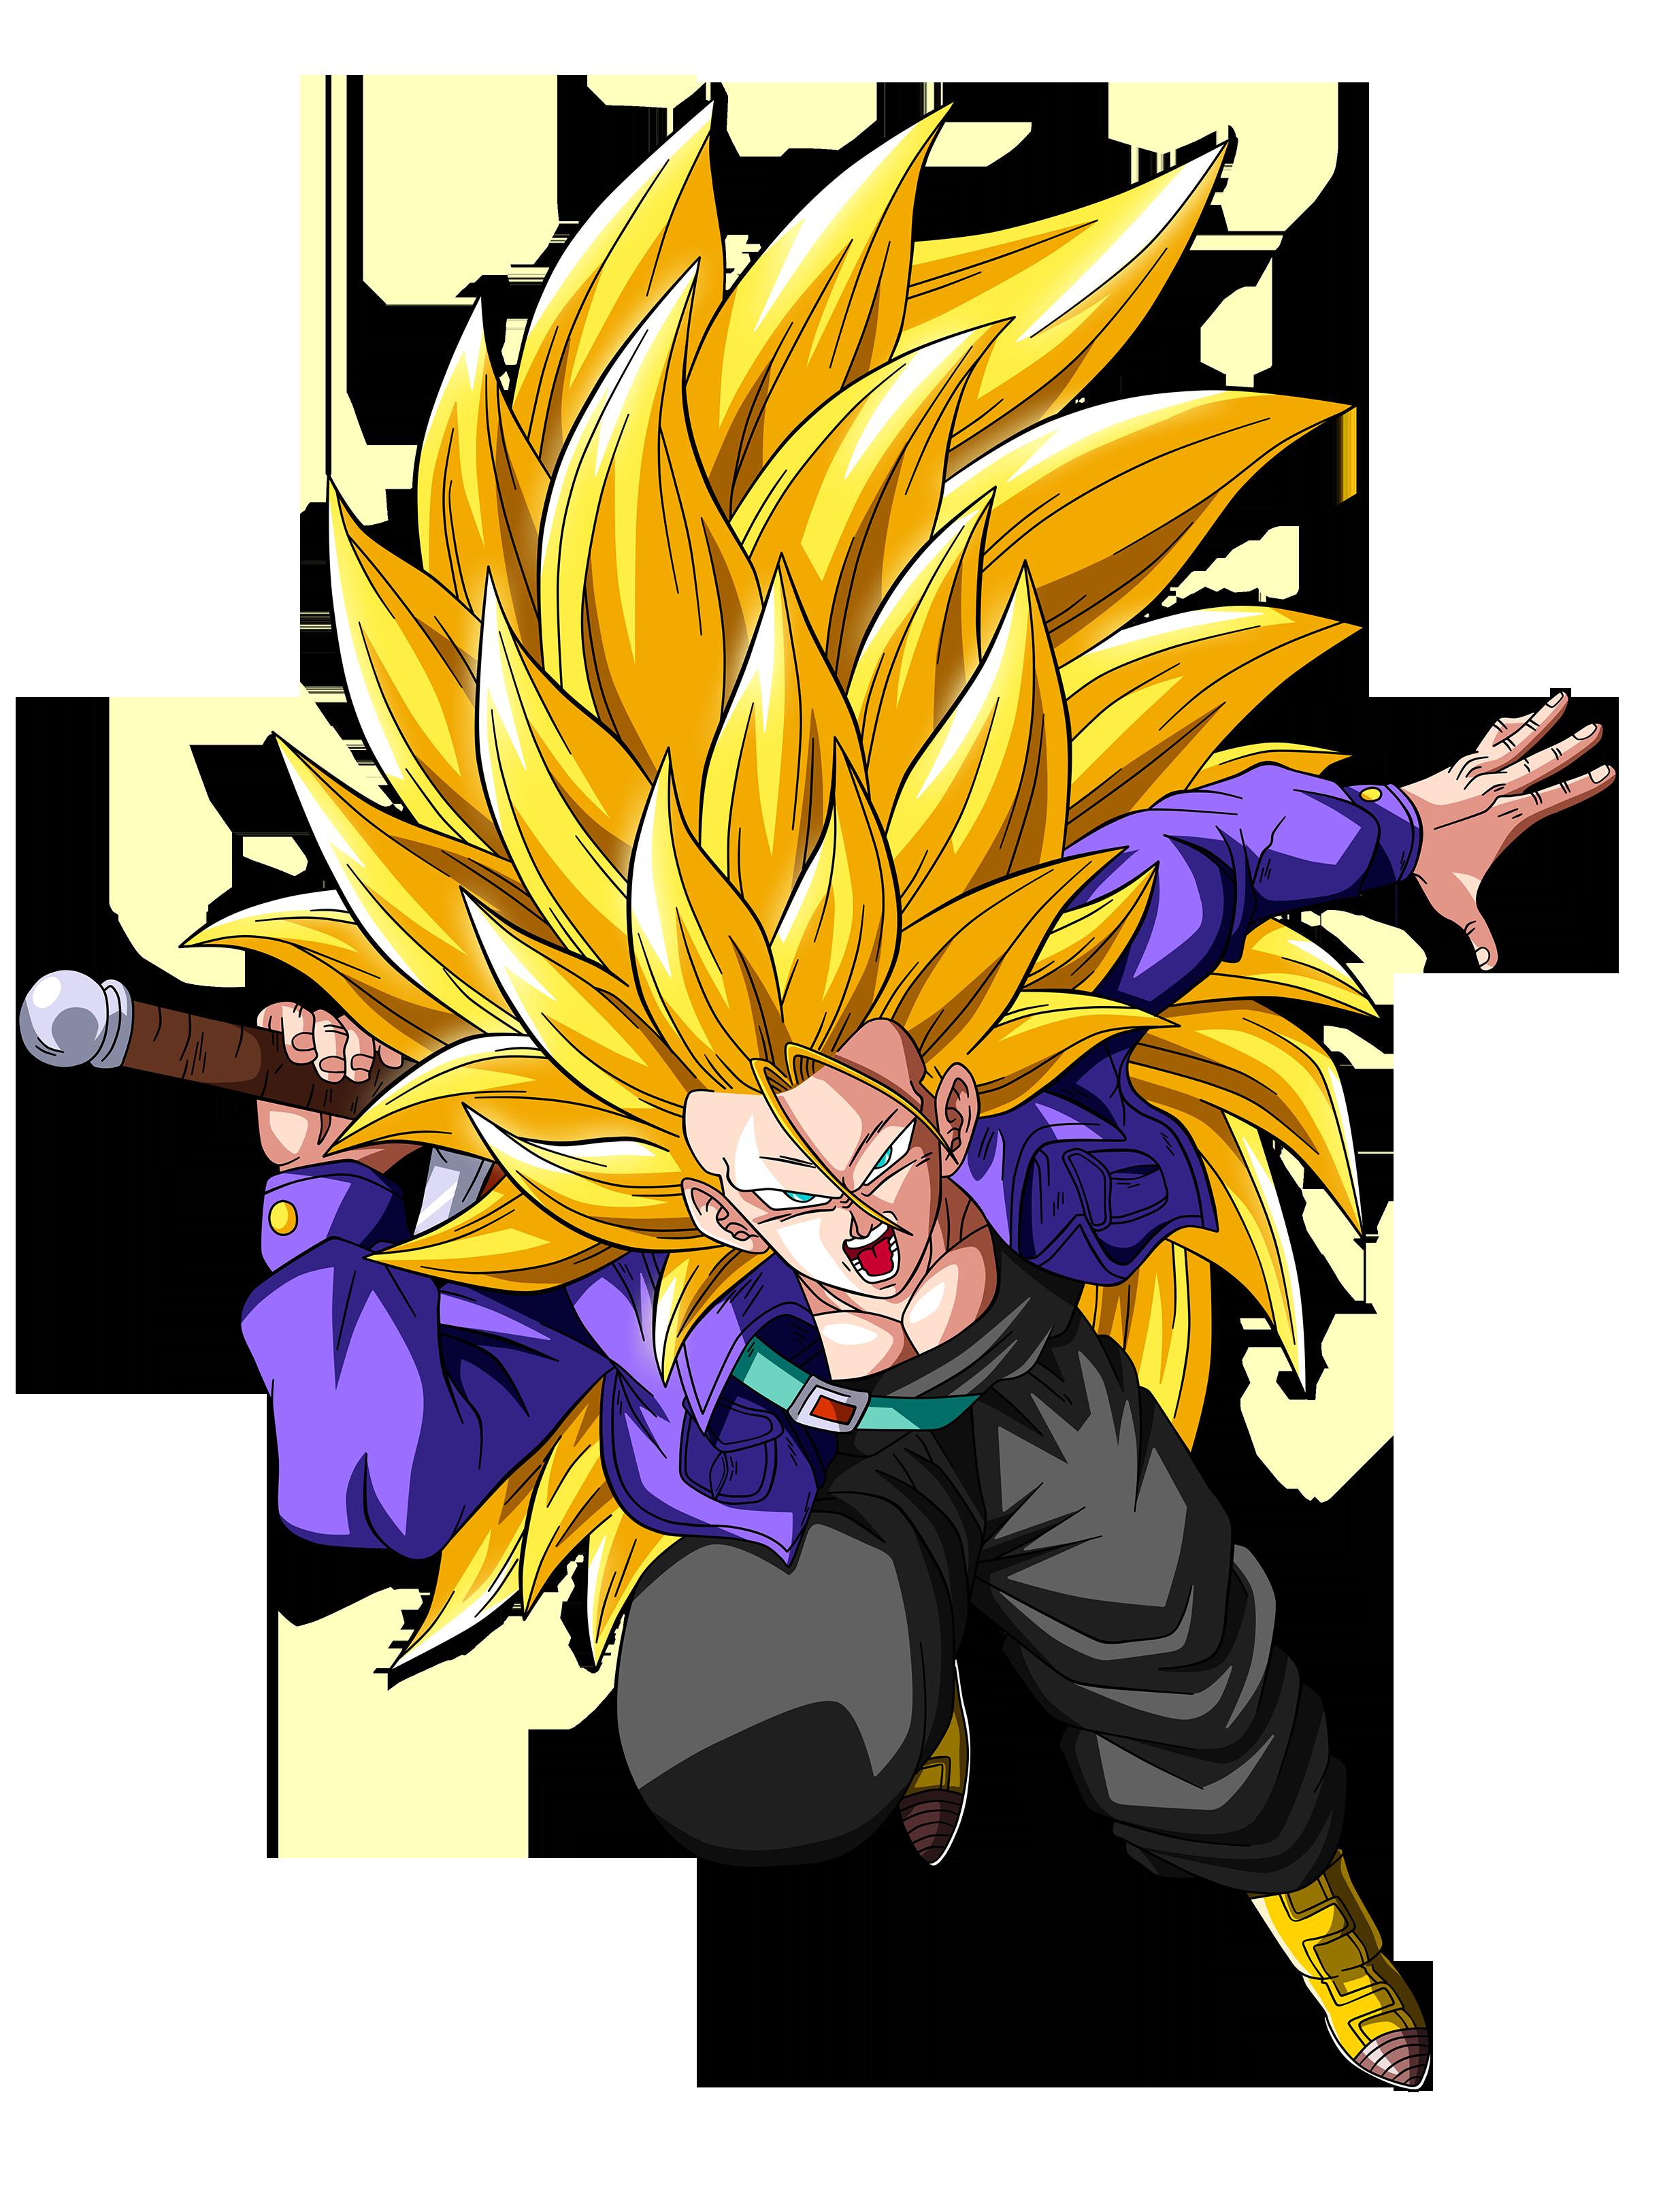 Trunks Super Saiyan 3 by OriginalSuperSaiyan on DeviantArt